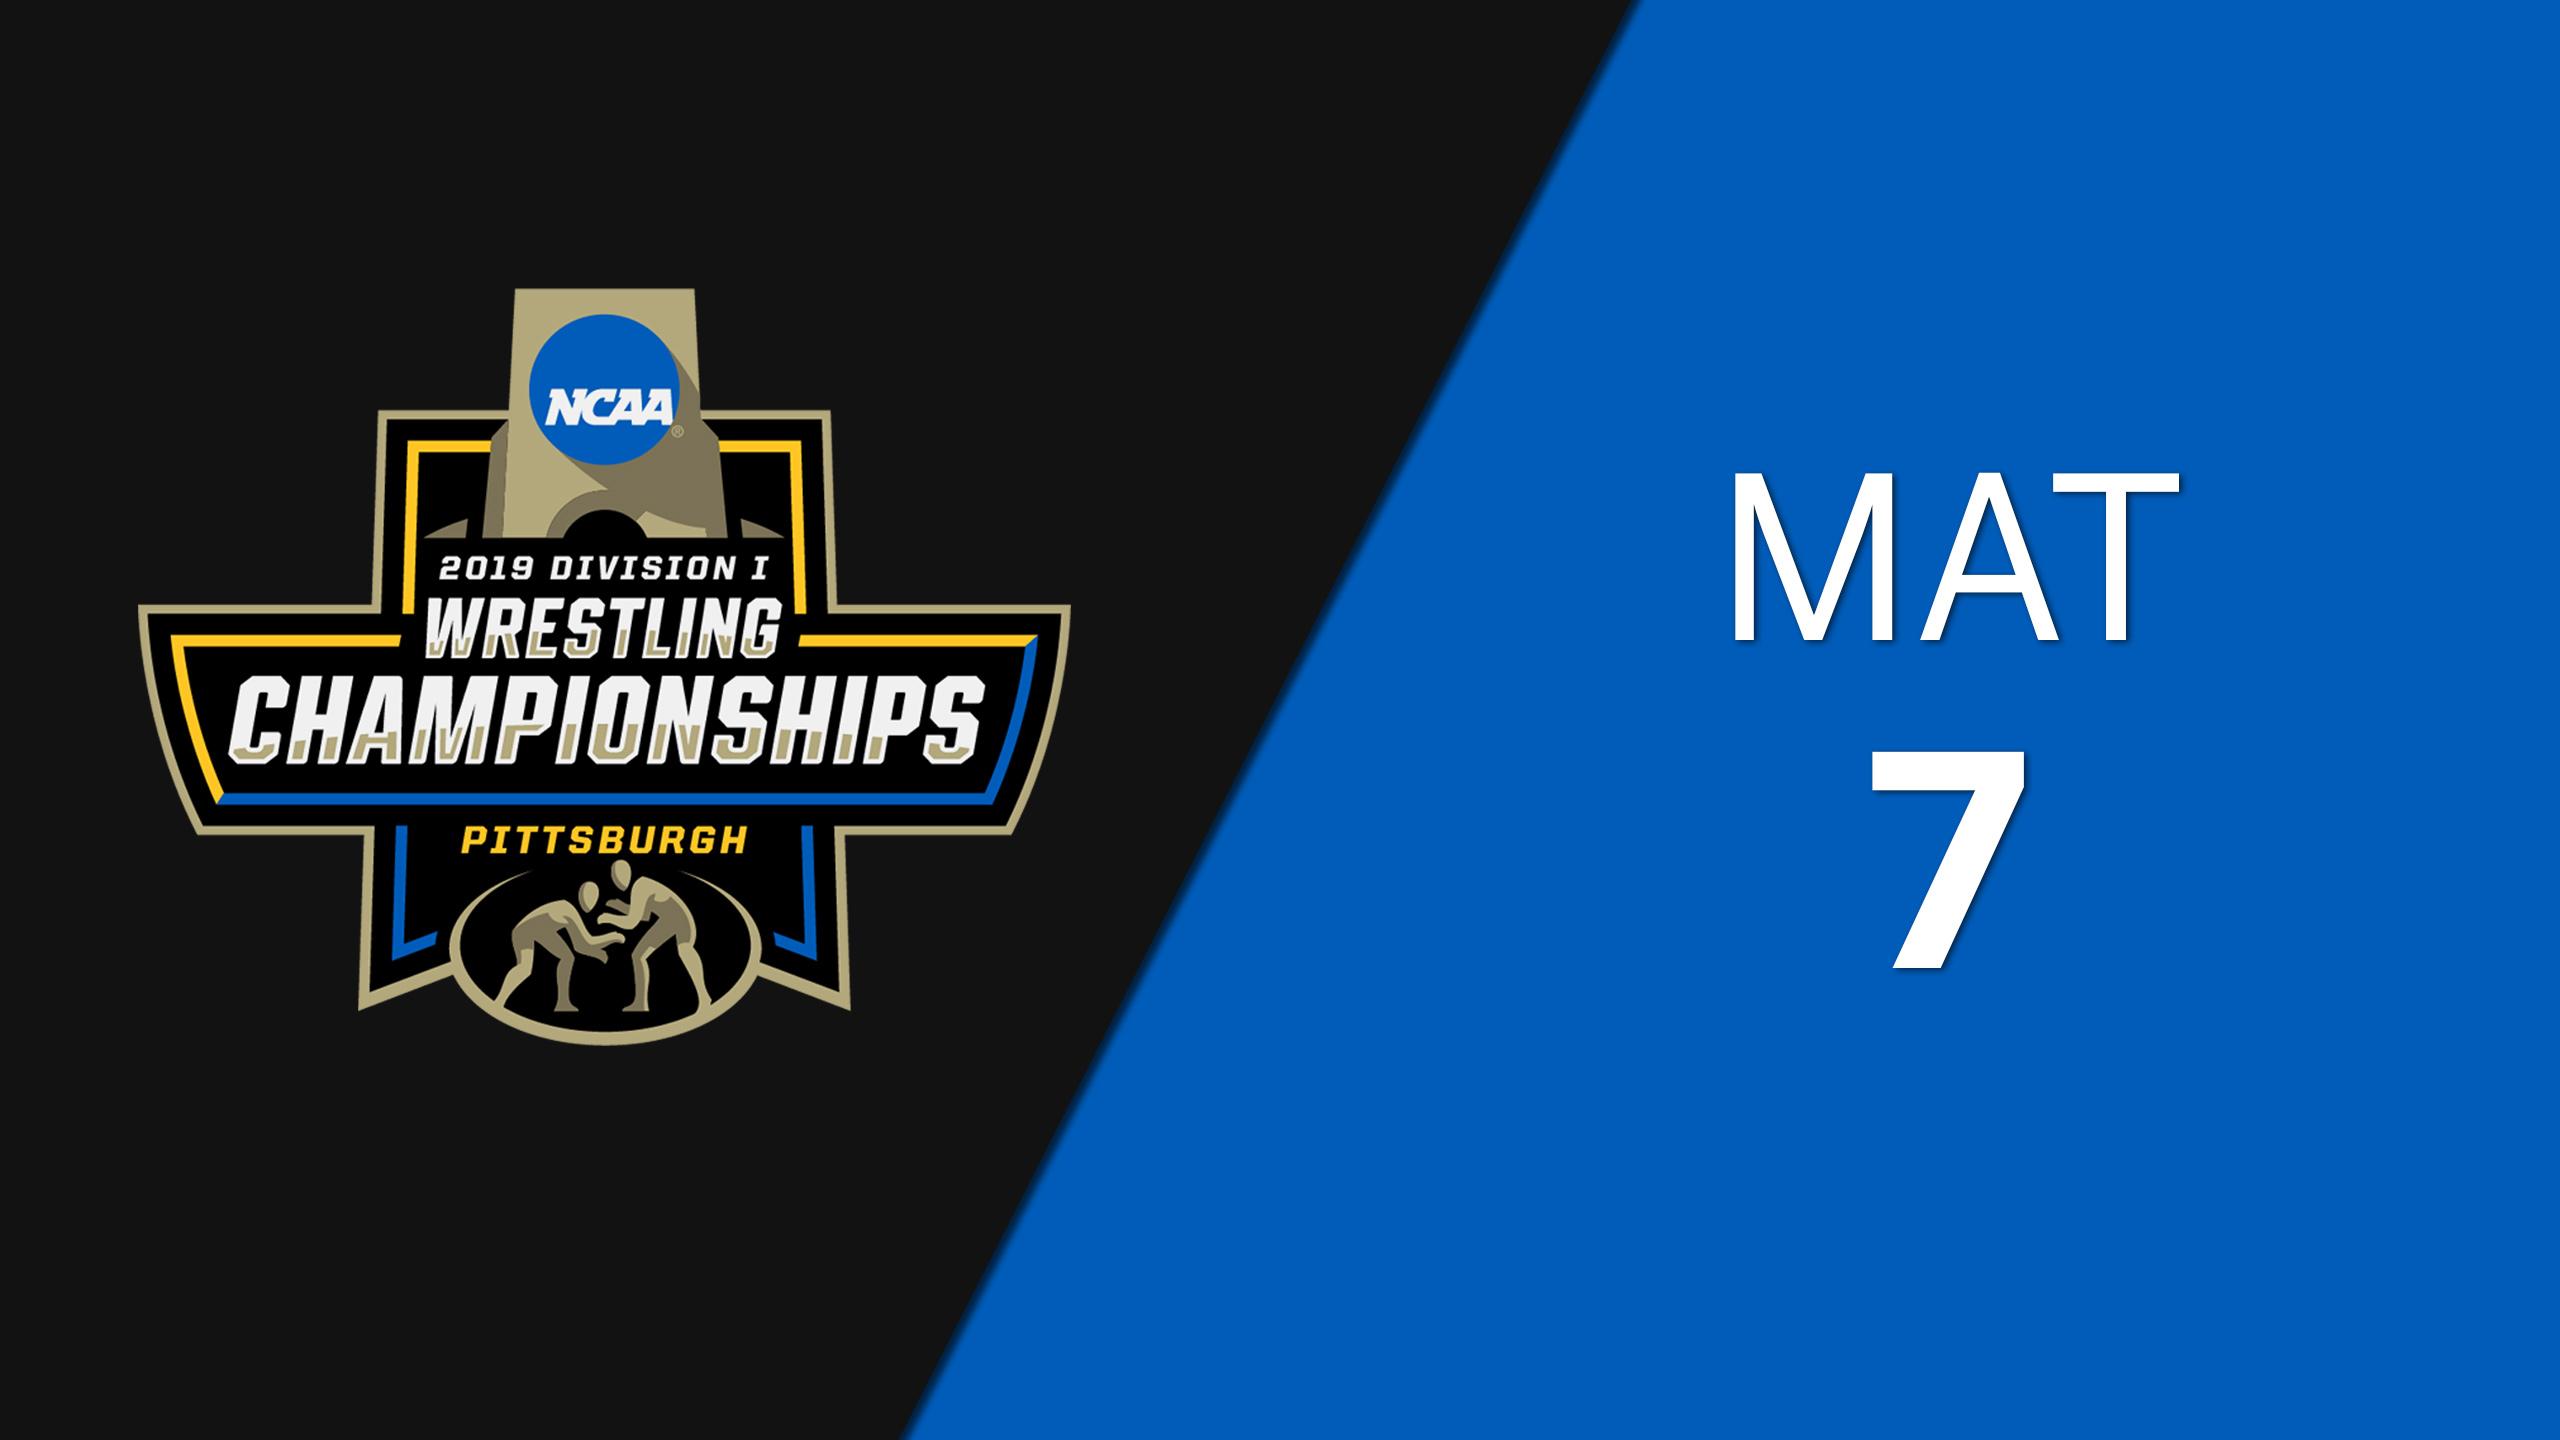 NCAA Wrestling Championship (Mat 7, Quarterfinals)